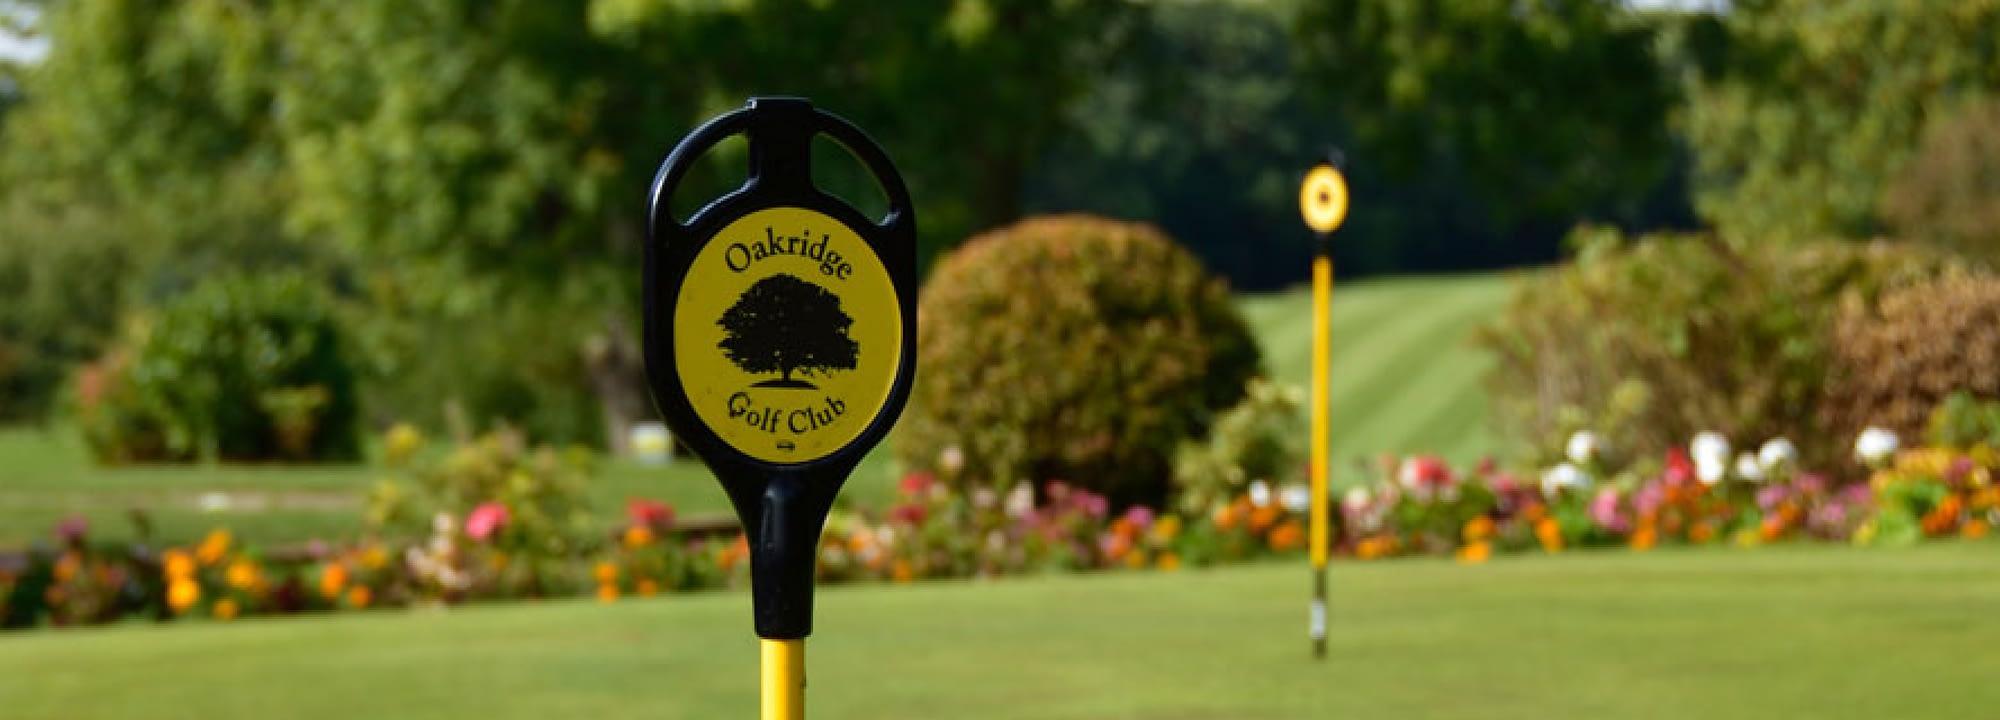 Oakridge Golf Club VisitorInformation